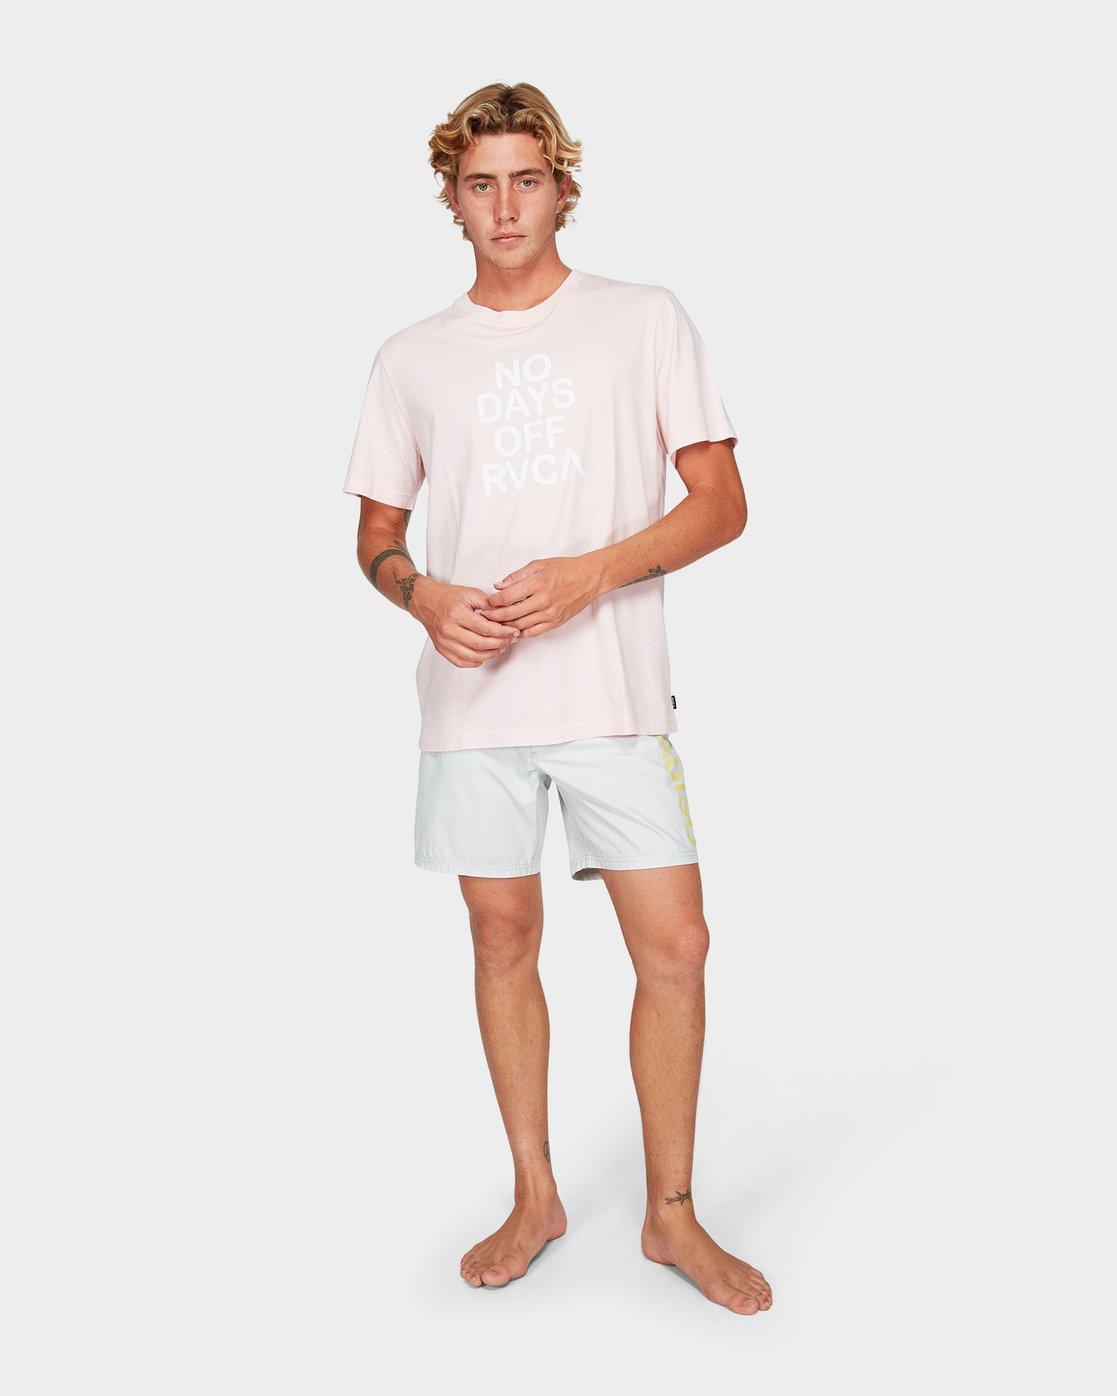 3 No Days Off Short Sleeve T-Shirt  R192058 RVCA